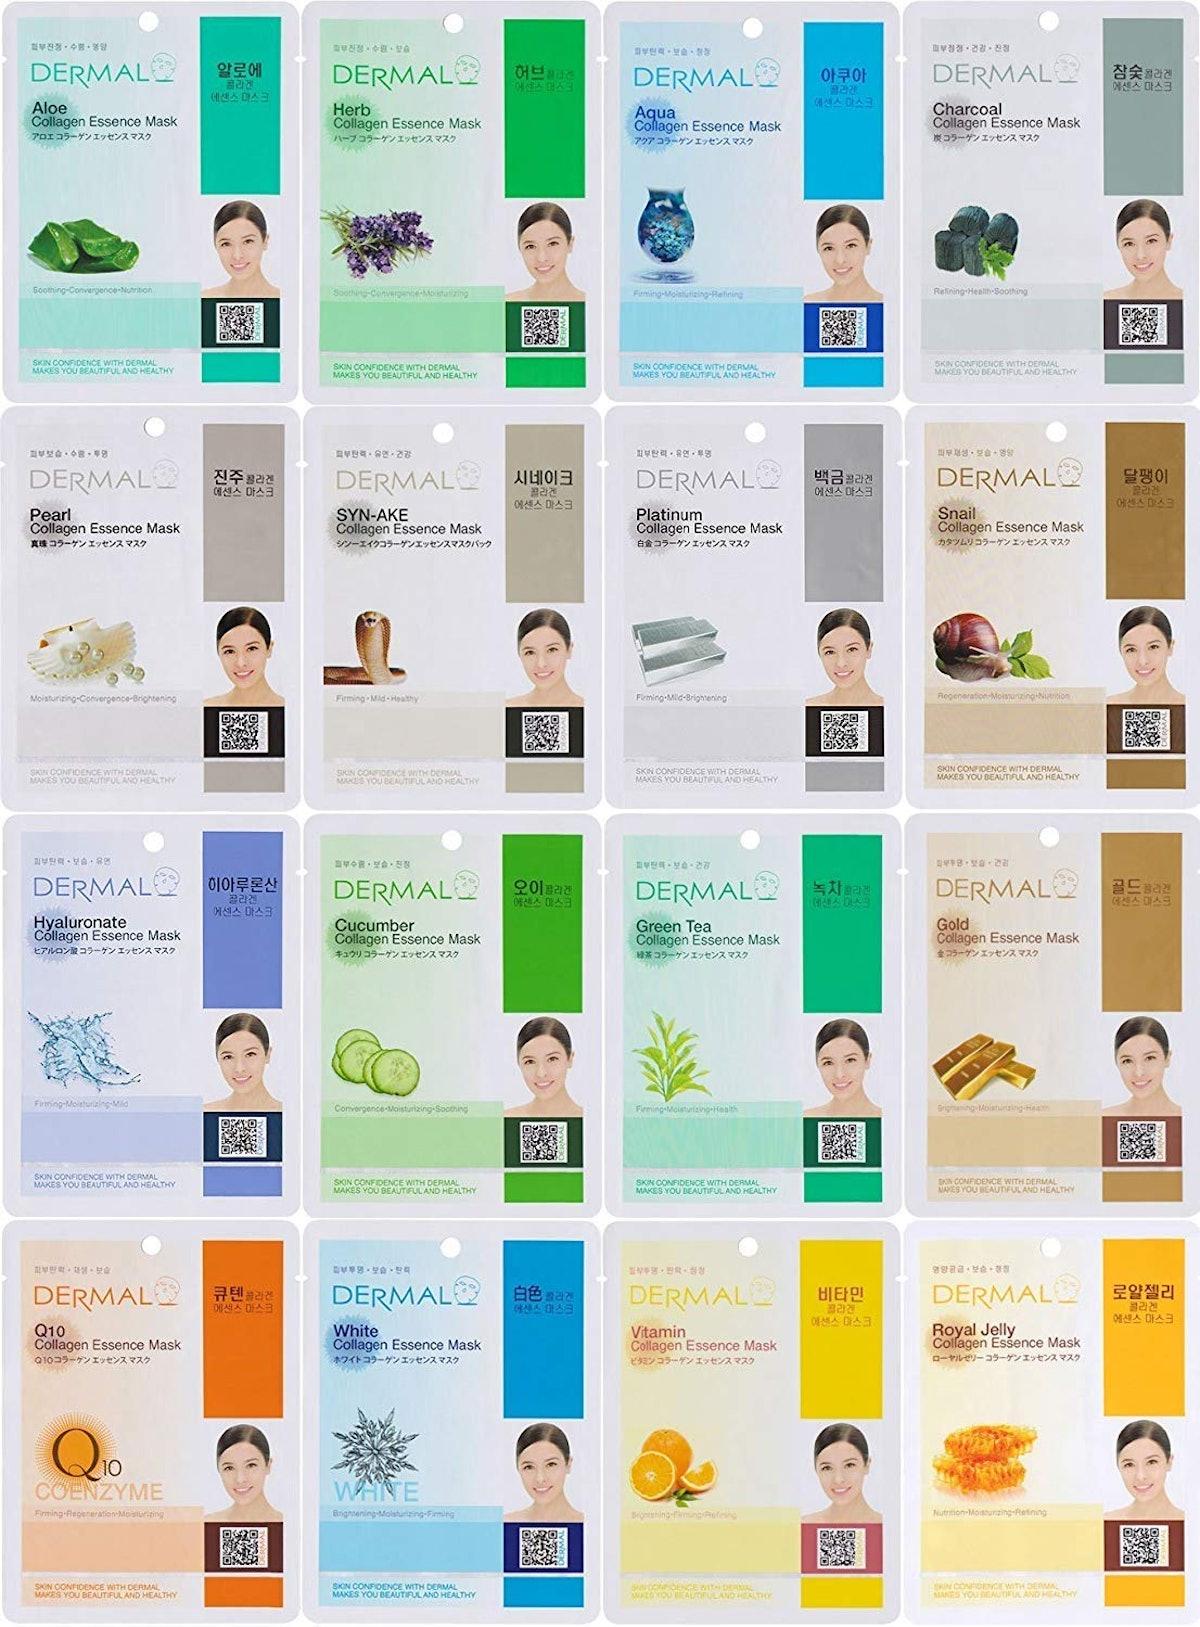 Dermal Korea Collagen Essence Full Face Facial Mask Sheet (16-Pack)